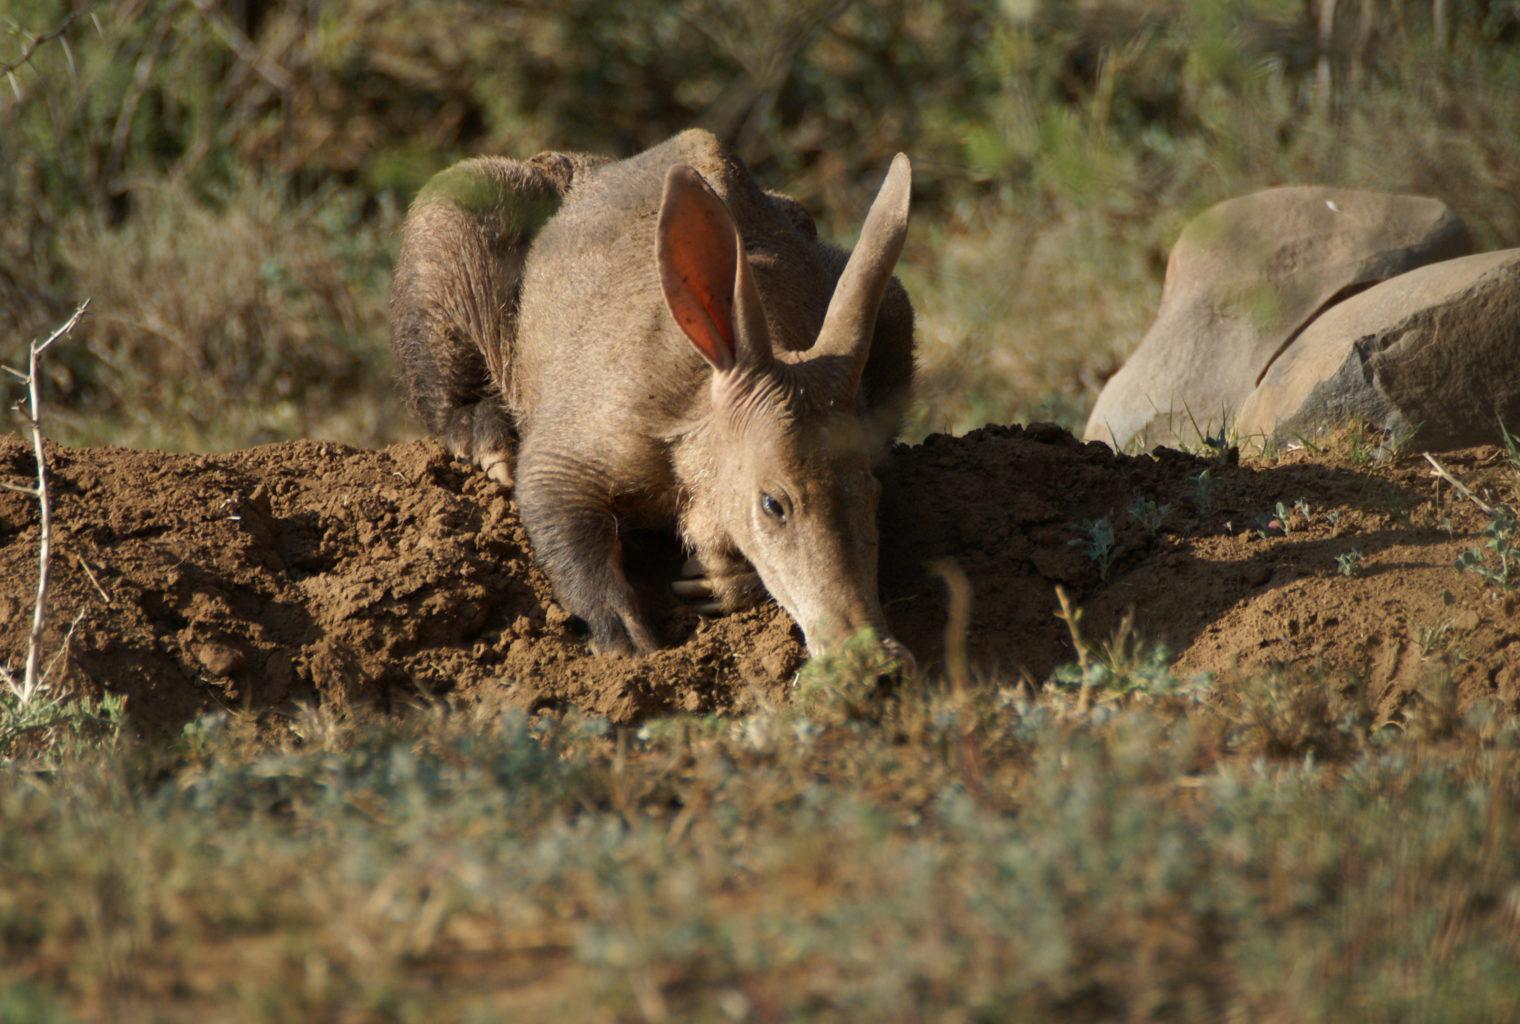 Aardvark in The Great Karoo